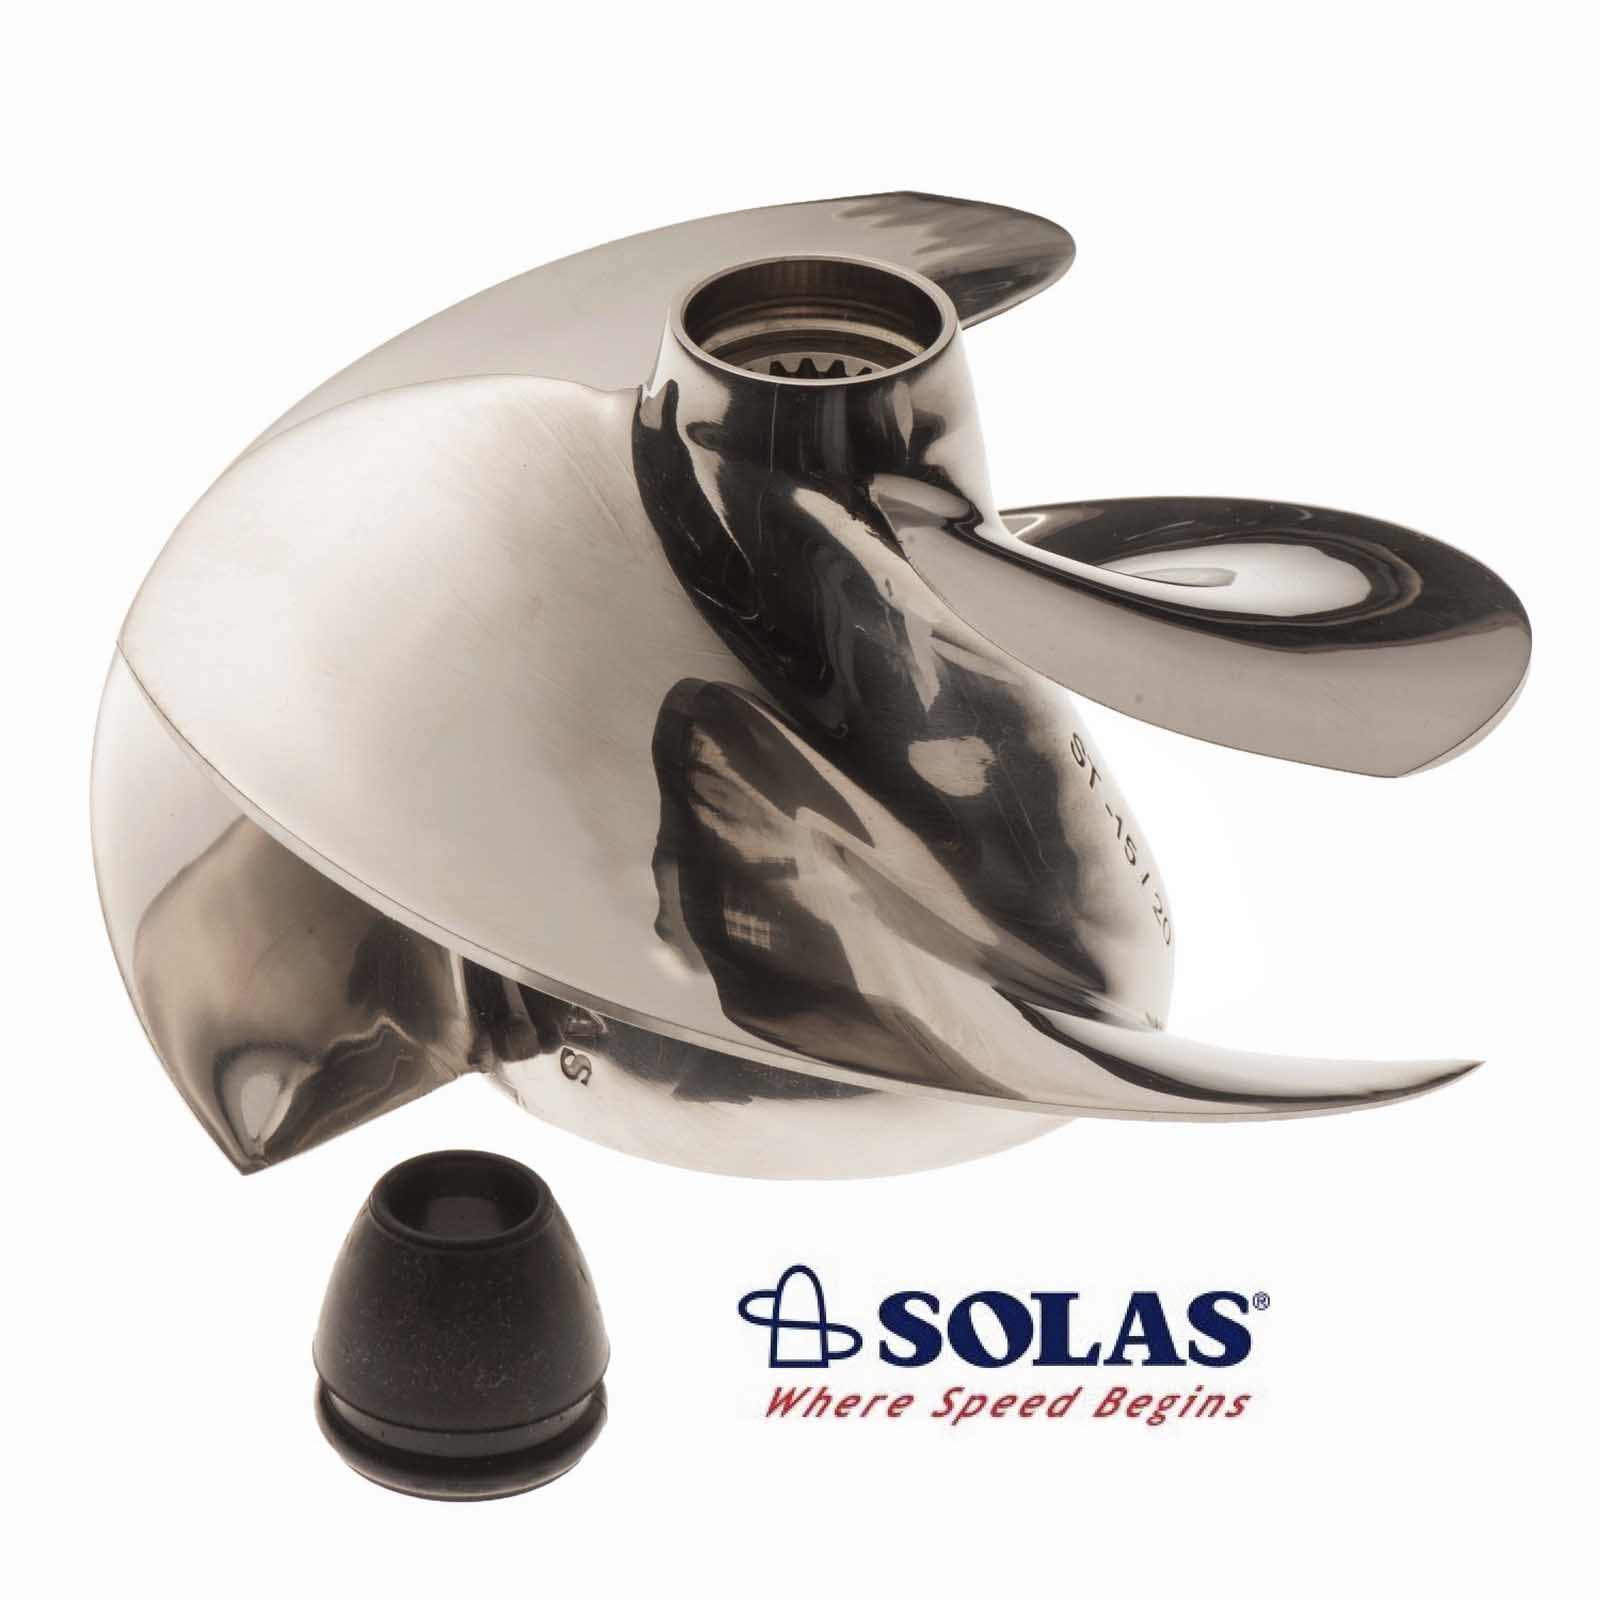 Details about Solas Sea Doo Impeller ST-CD-15/20 951 XP GSX GTX RX LRV  Limited DI